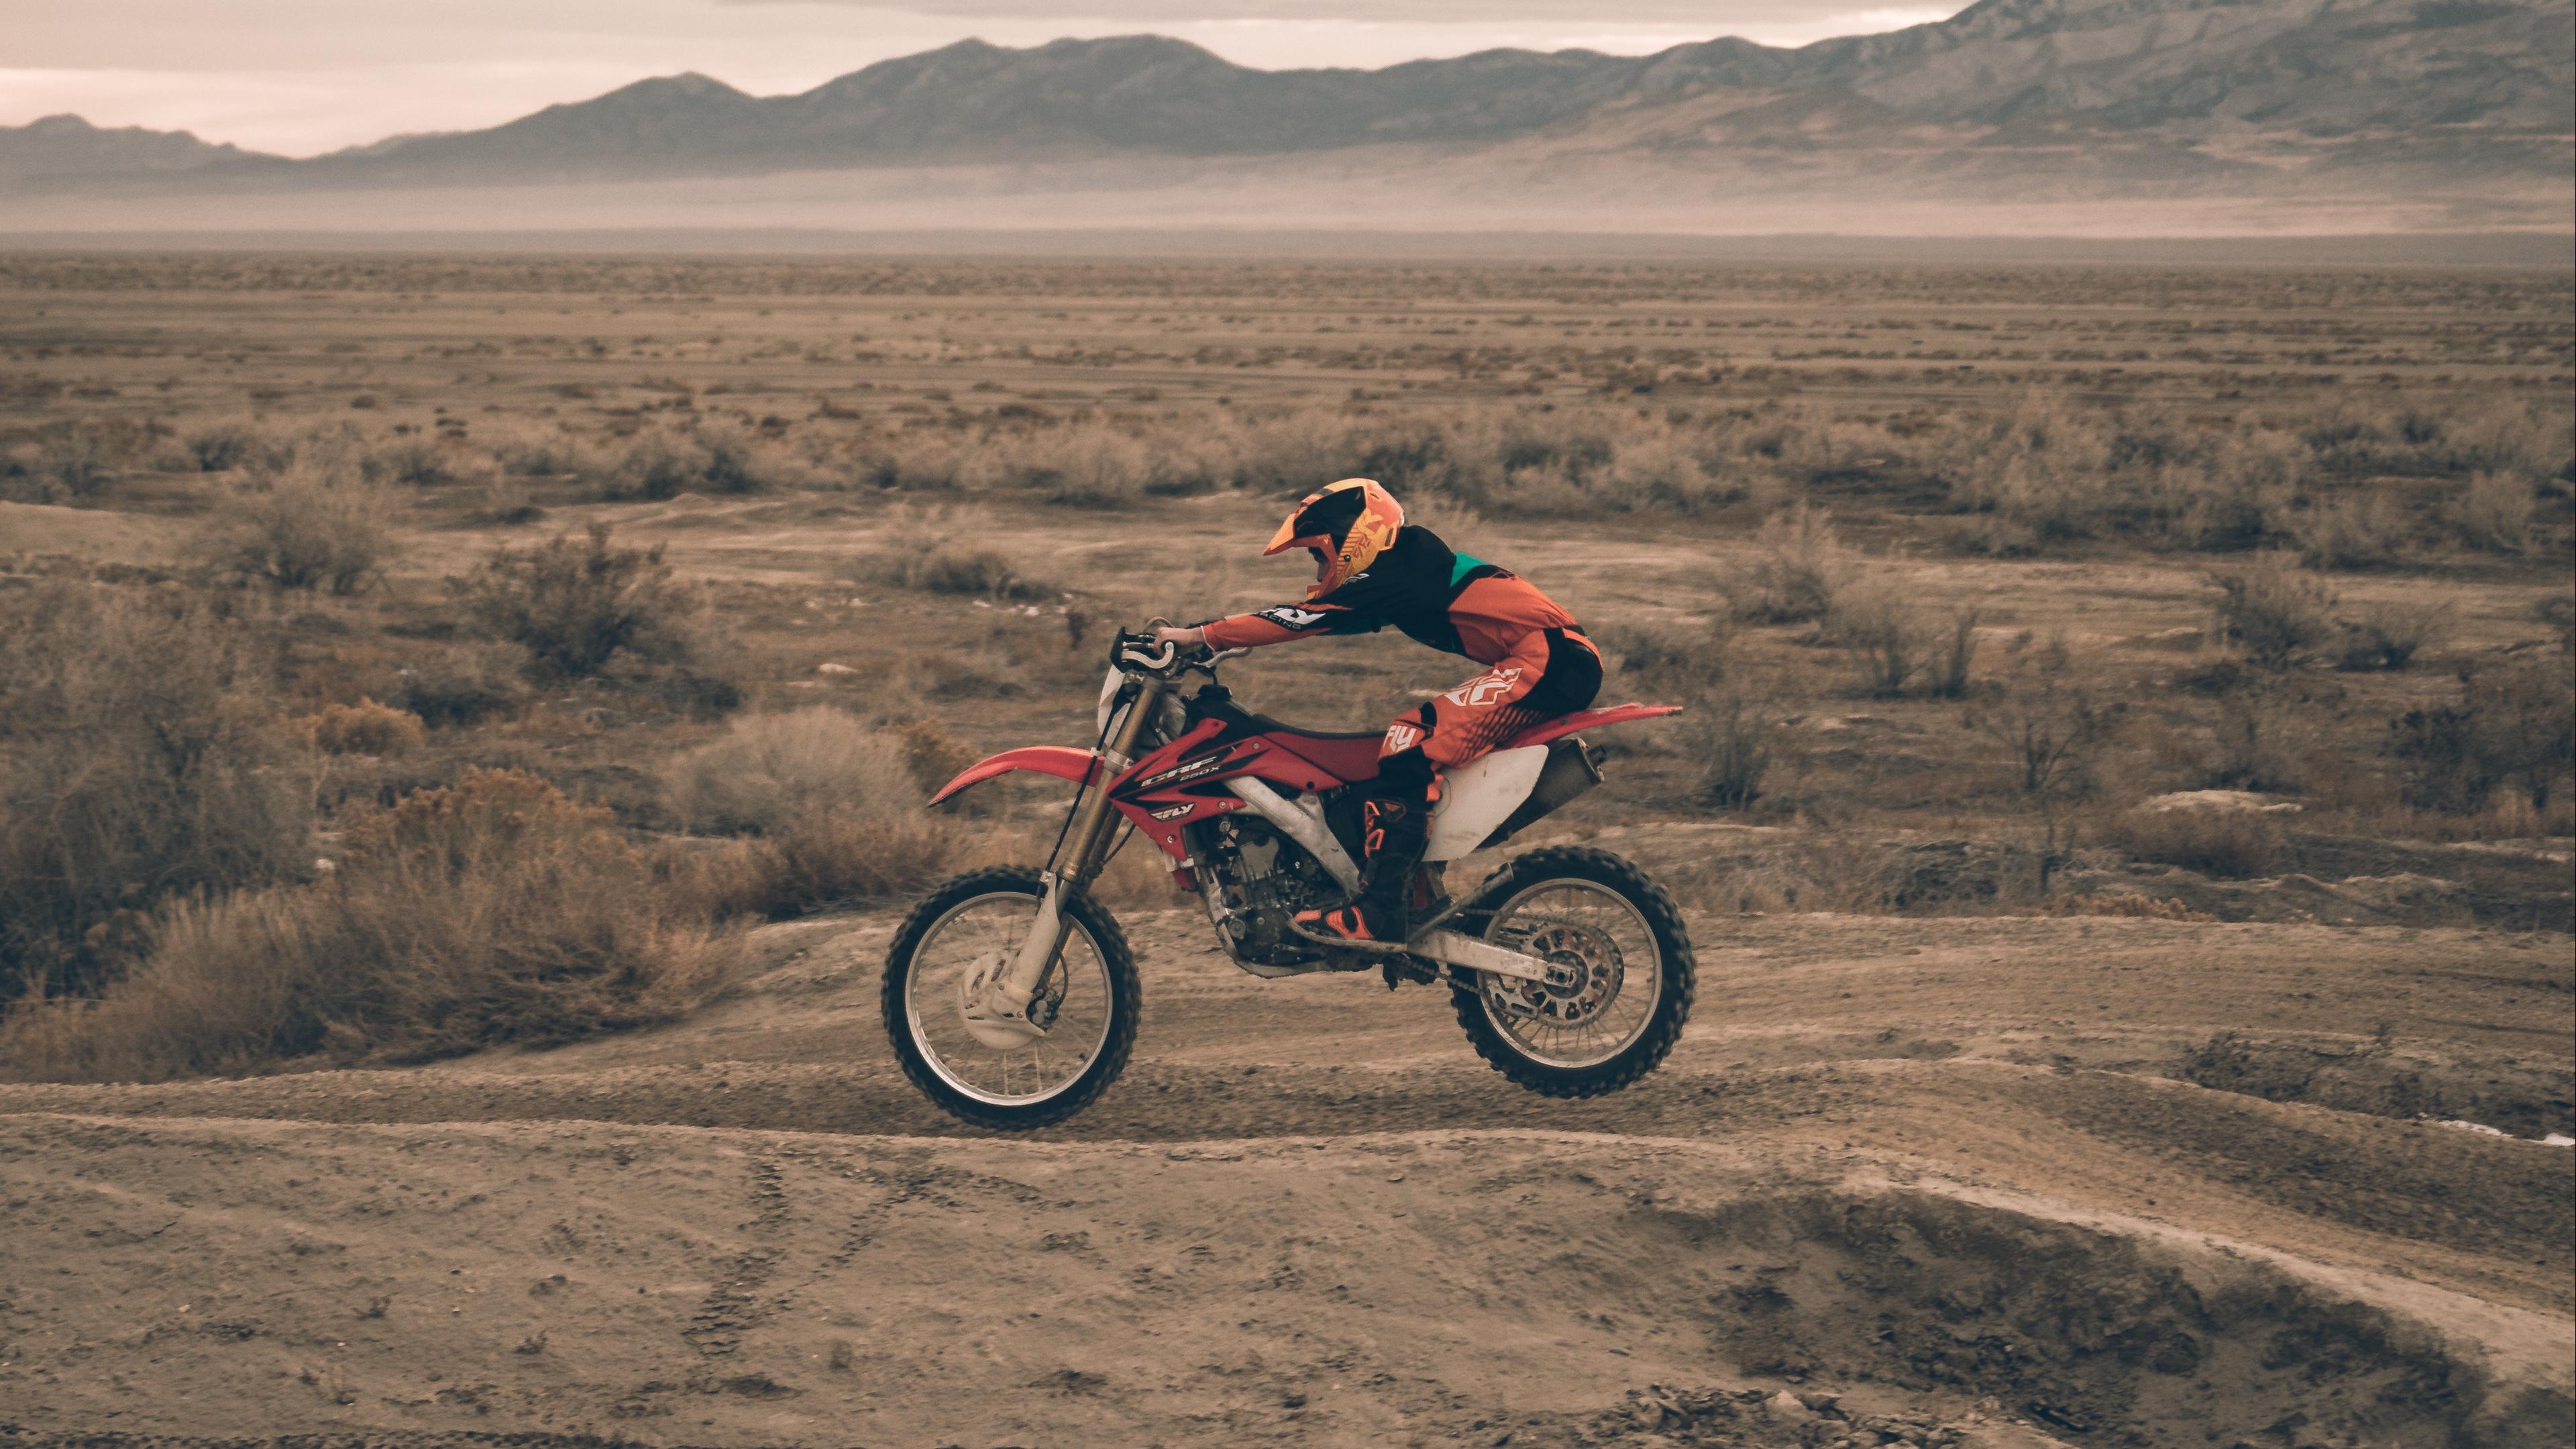 motorcyclist motorcycling sand 4k 1538943853 - motorcyclist, motorcycling, sand 4k - Sand, motorcyclist, motorcycling